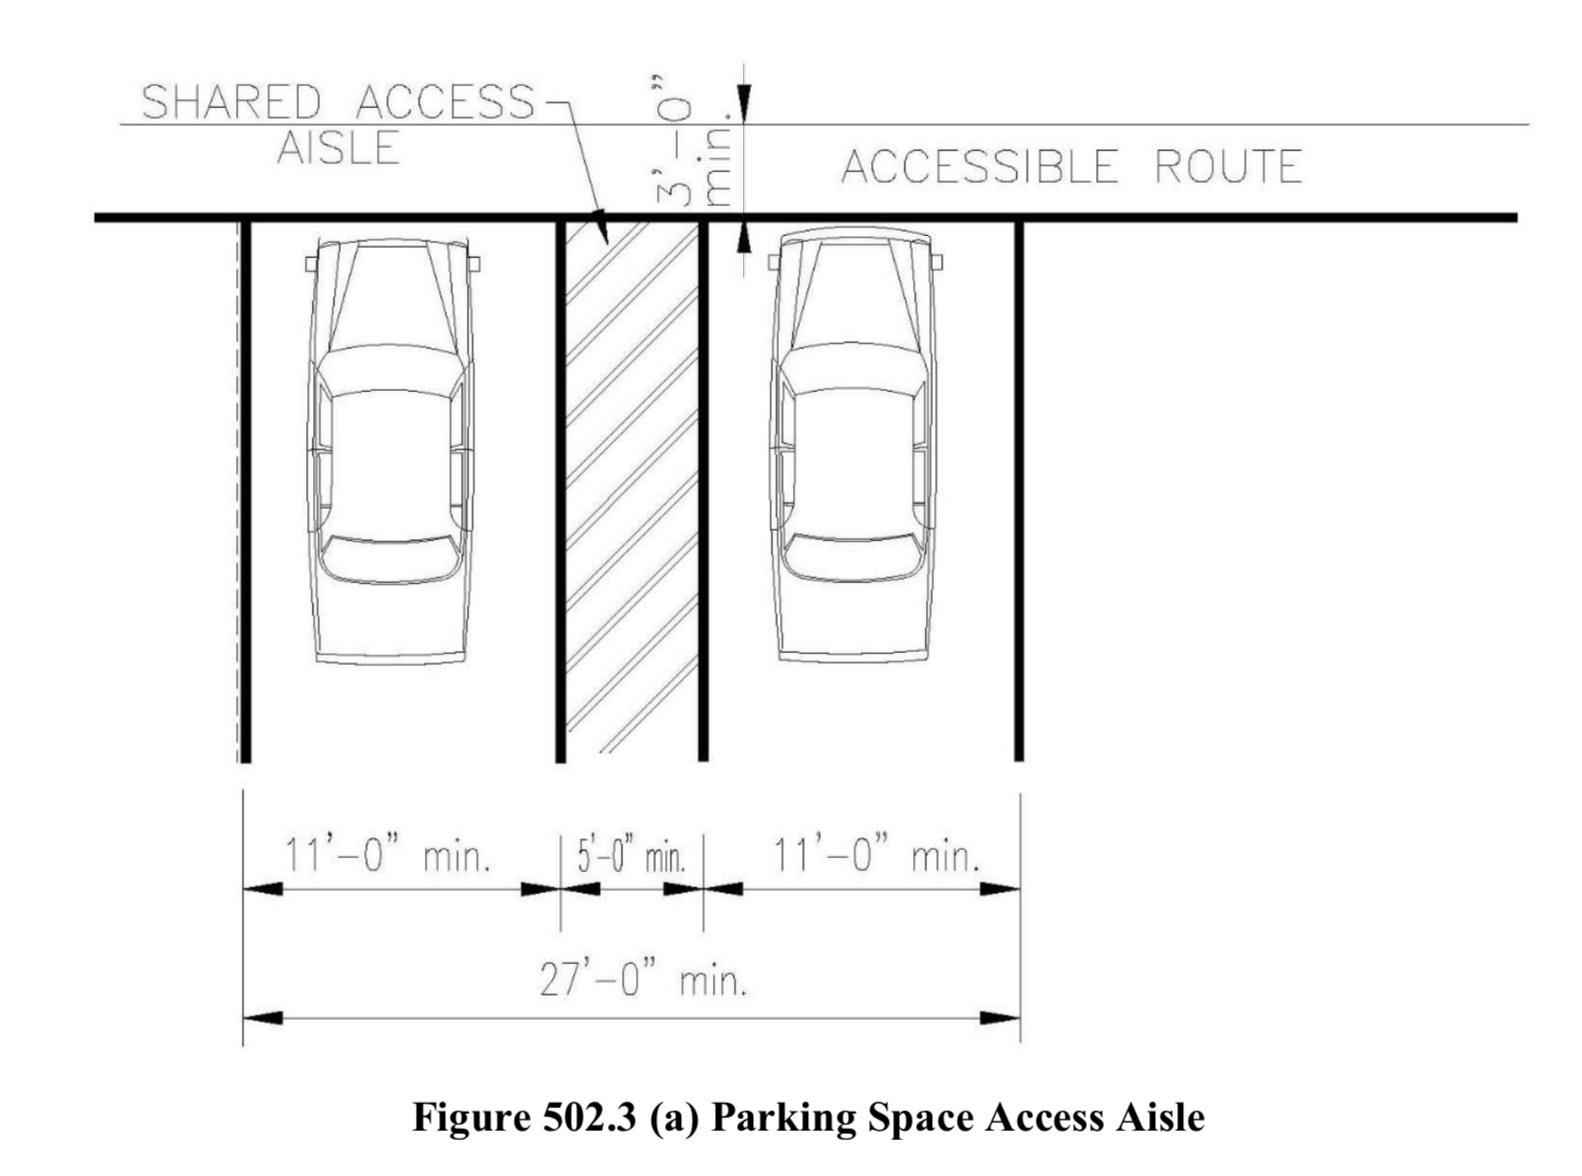 Figure 502.3(a) Parking Space Access Aisle. A sample design of the shared parking access aisle. Image: Illinois Capital Development Board/Illinois Accessibility Code